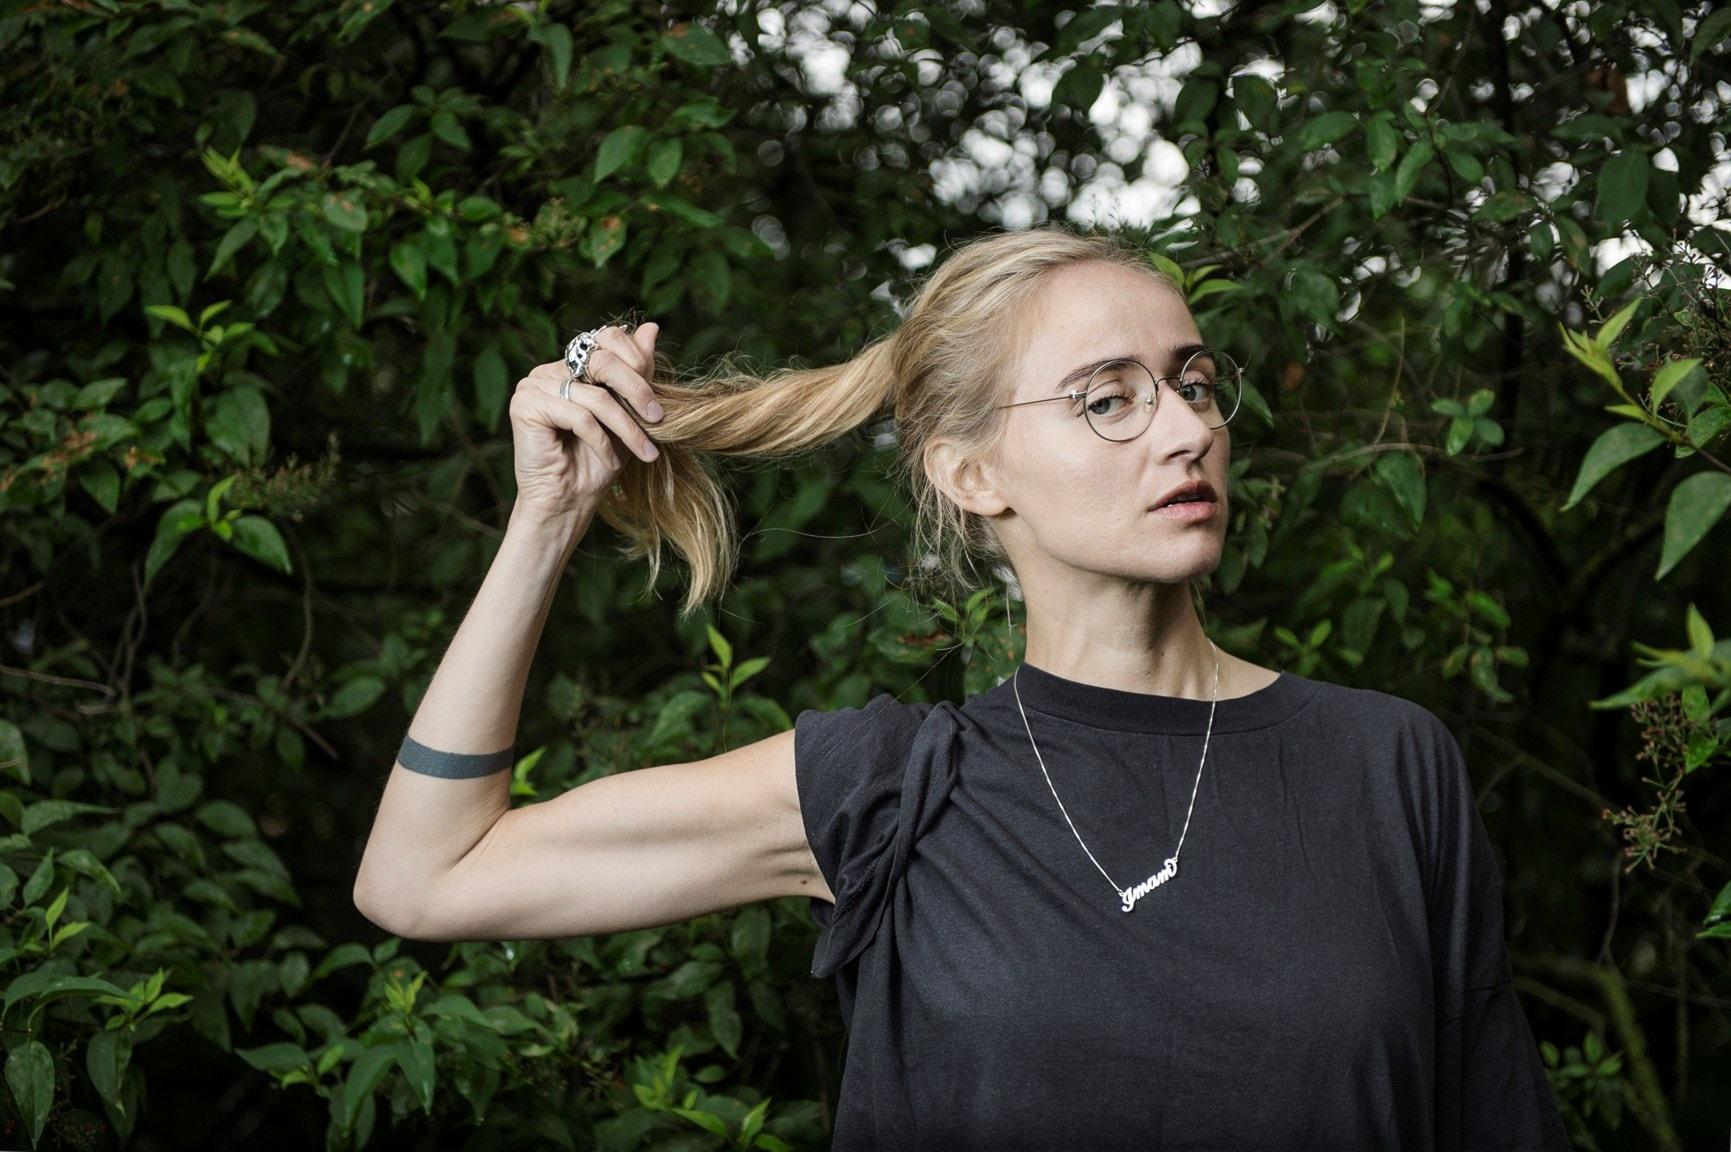 Svenska lesbisk Pussy